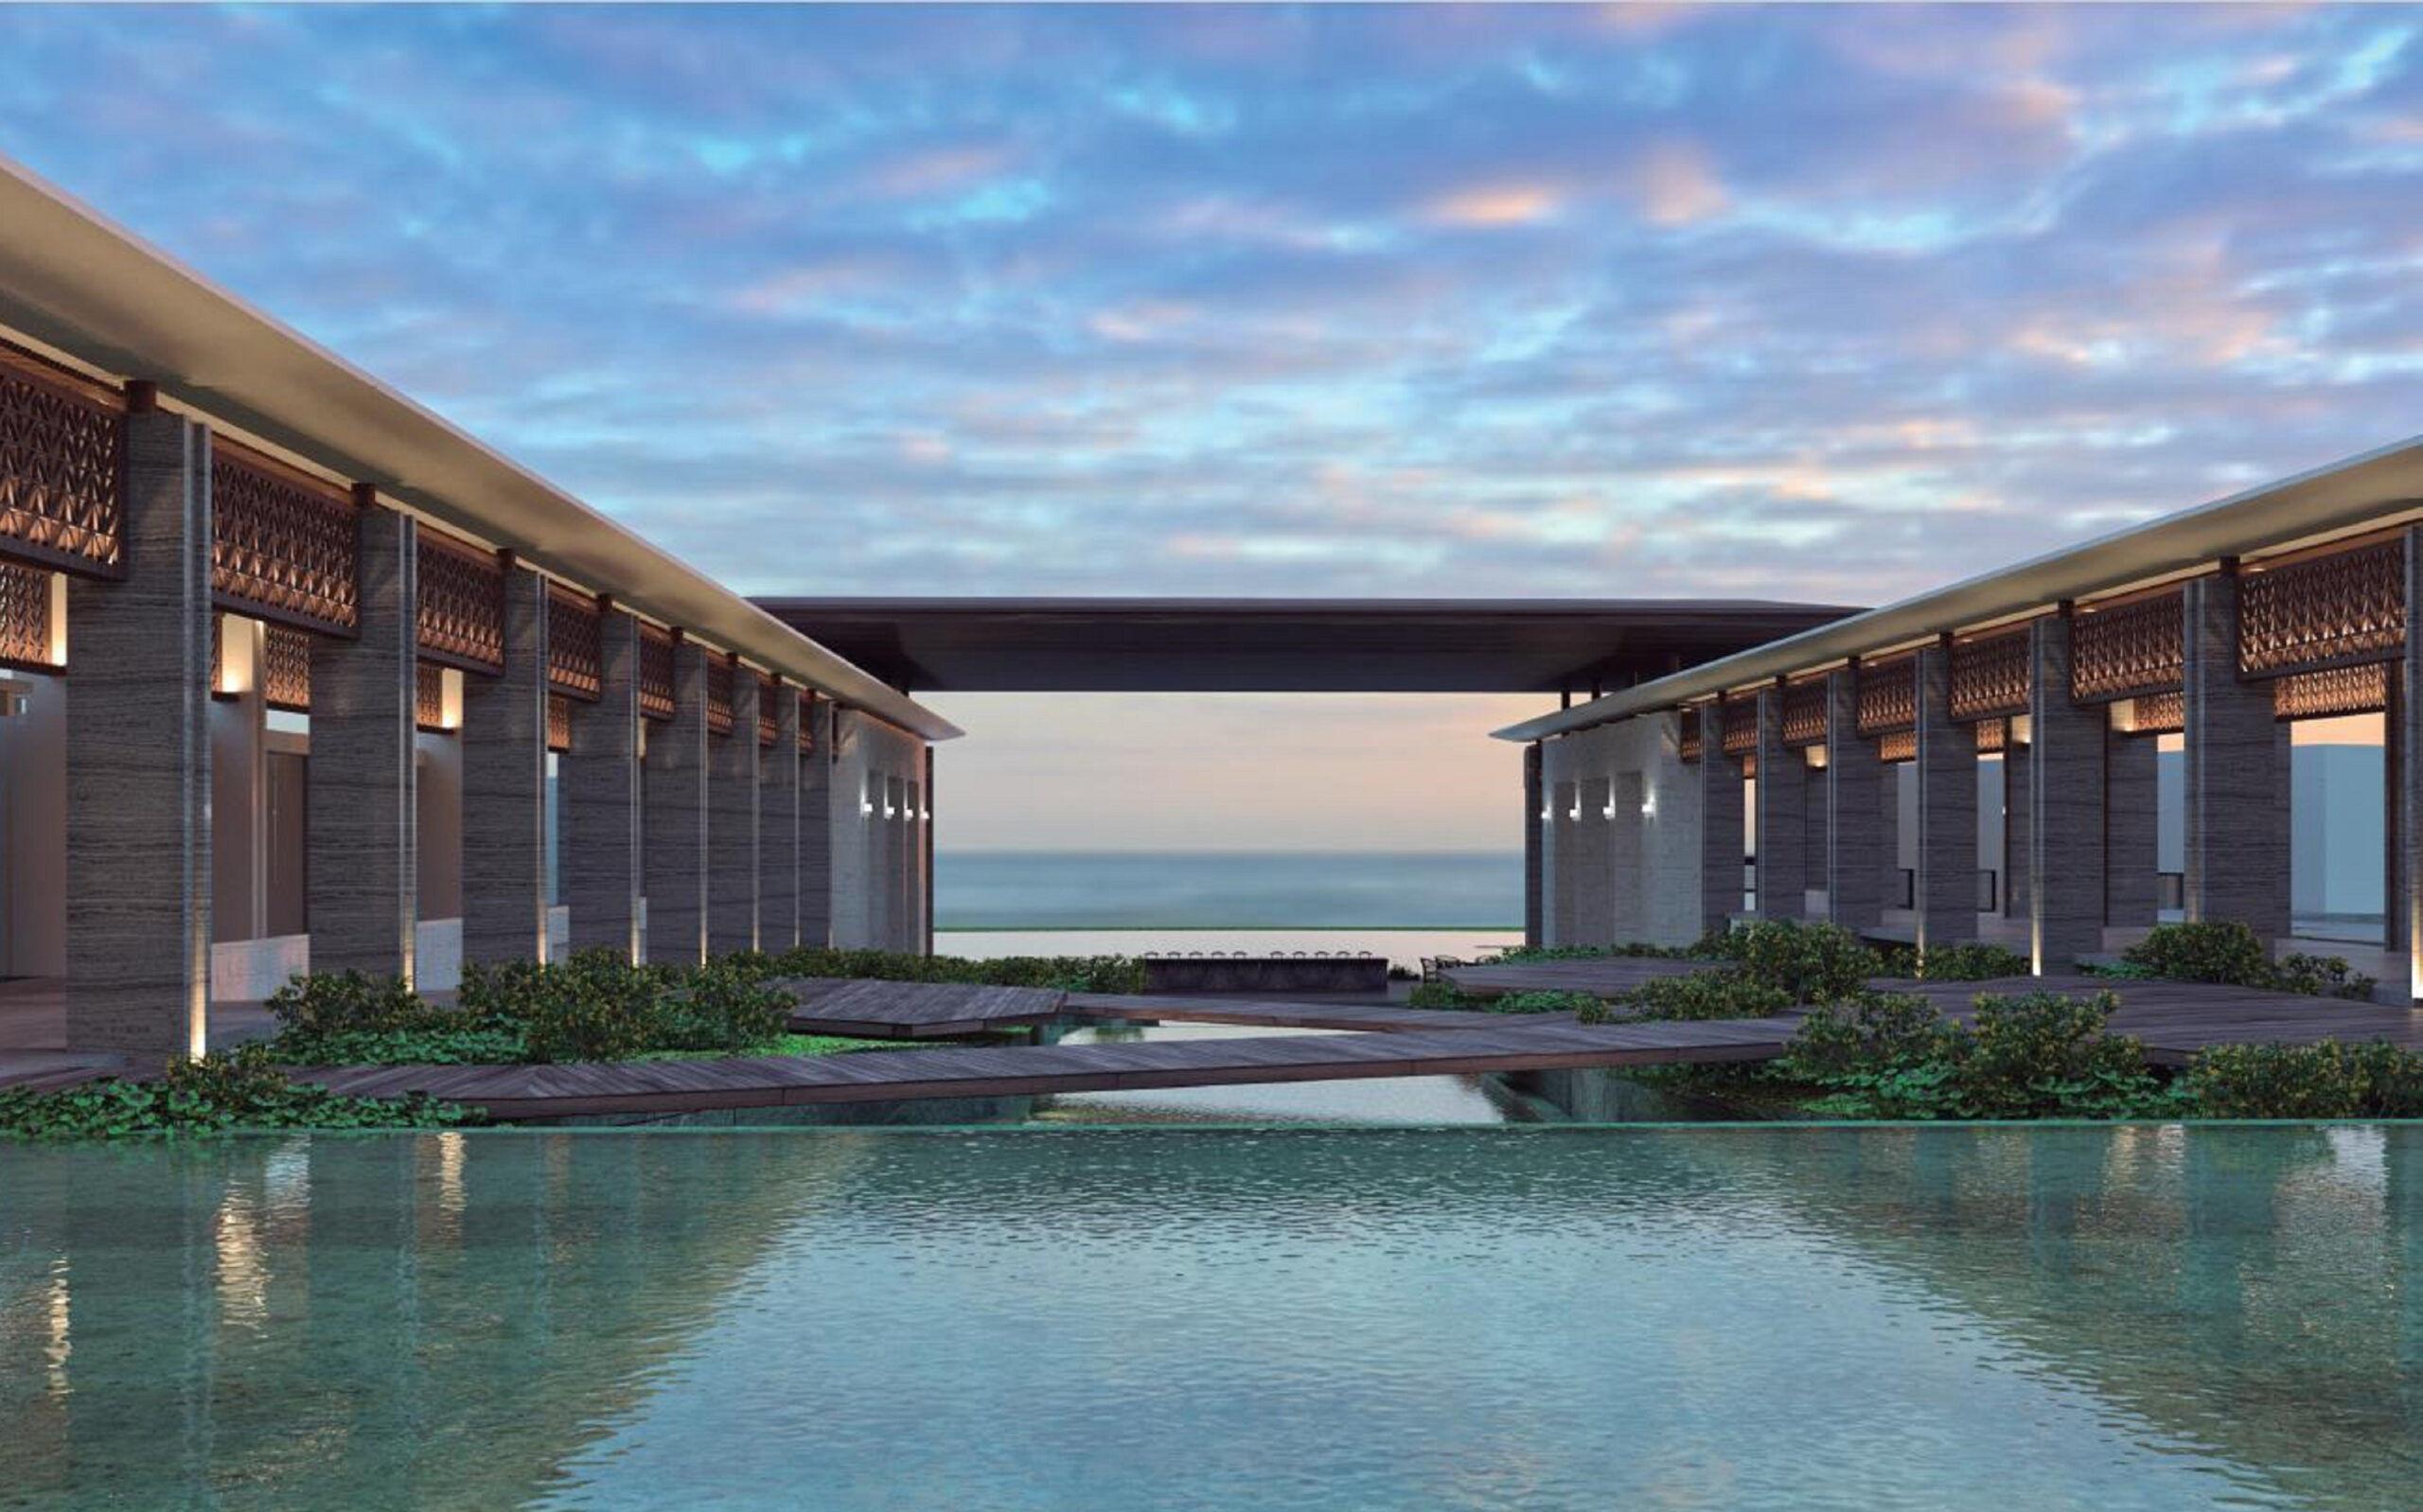 Hoteles_Hilton_Mexico_alt-scaled